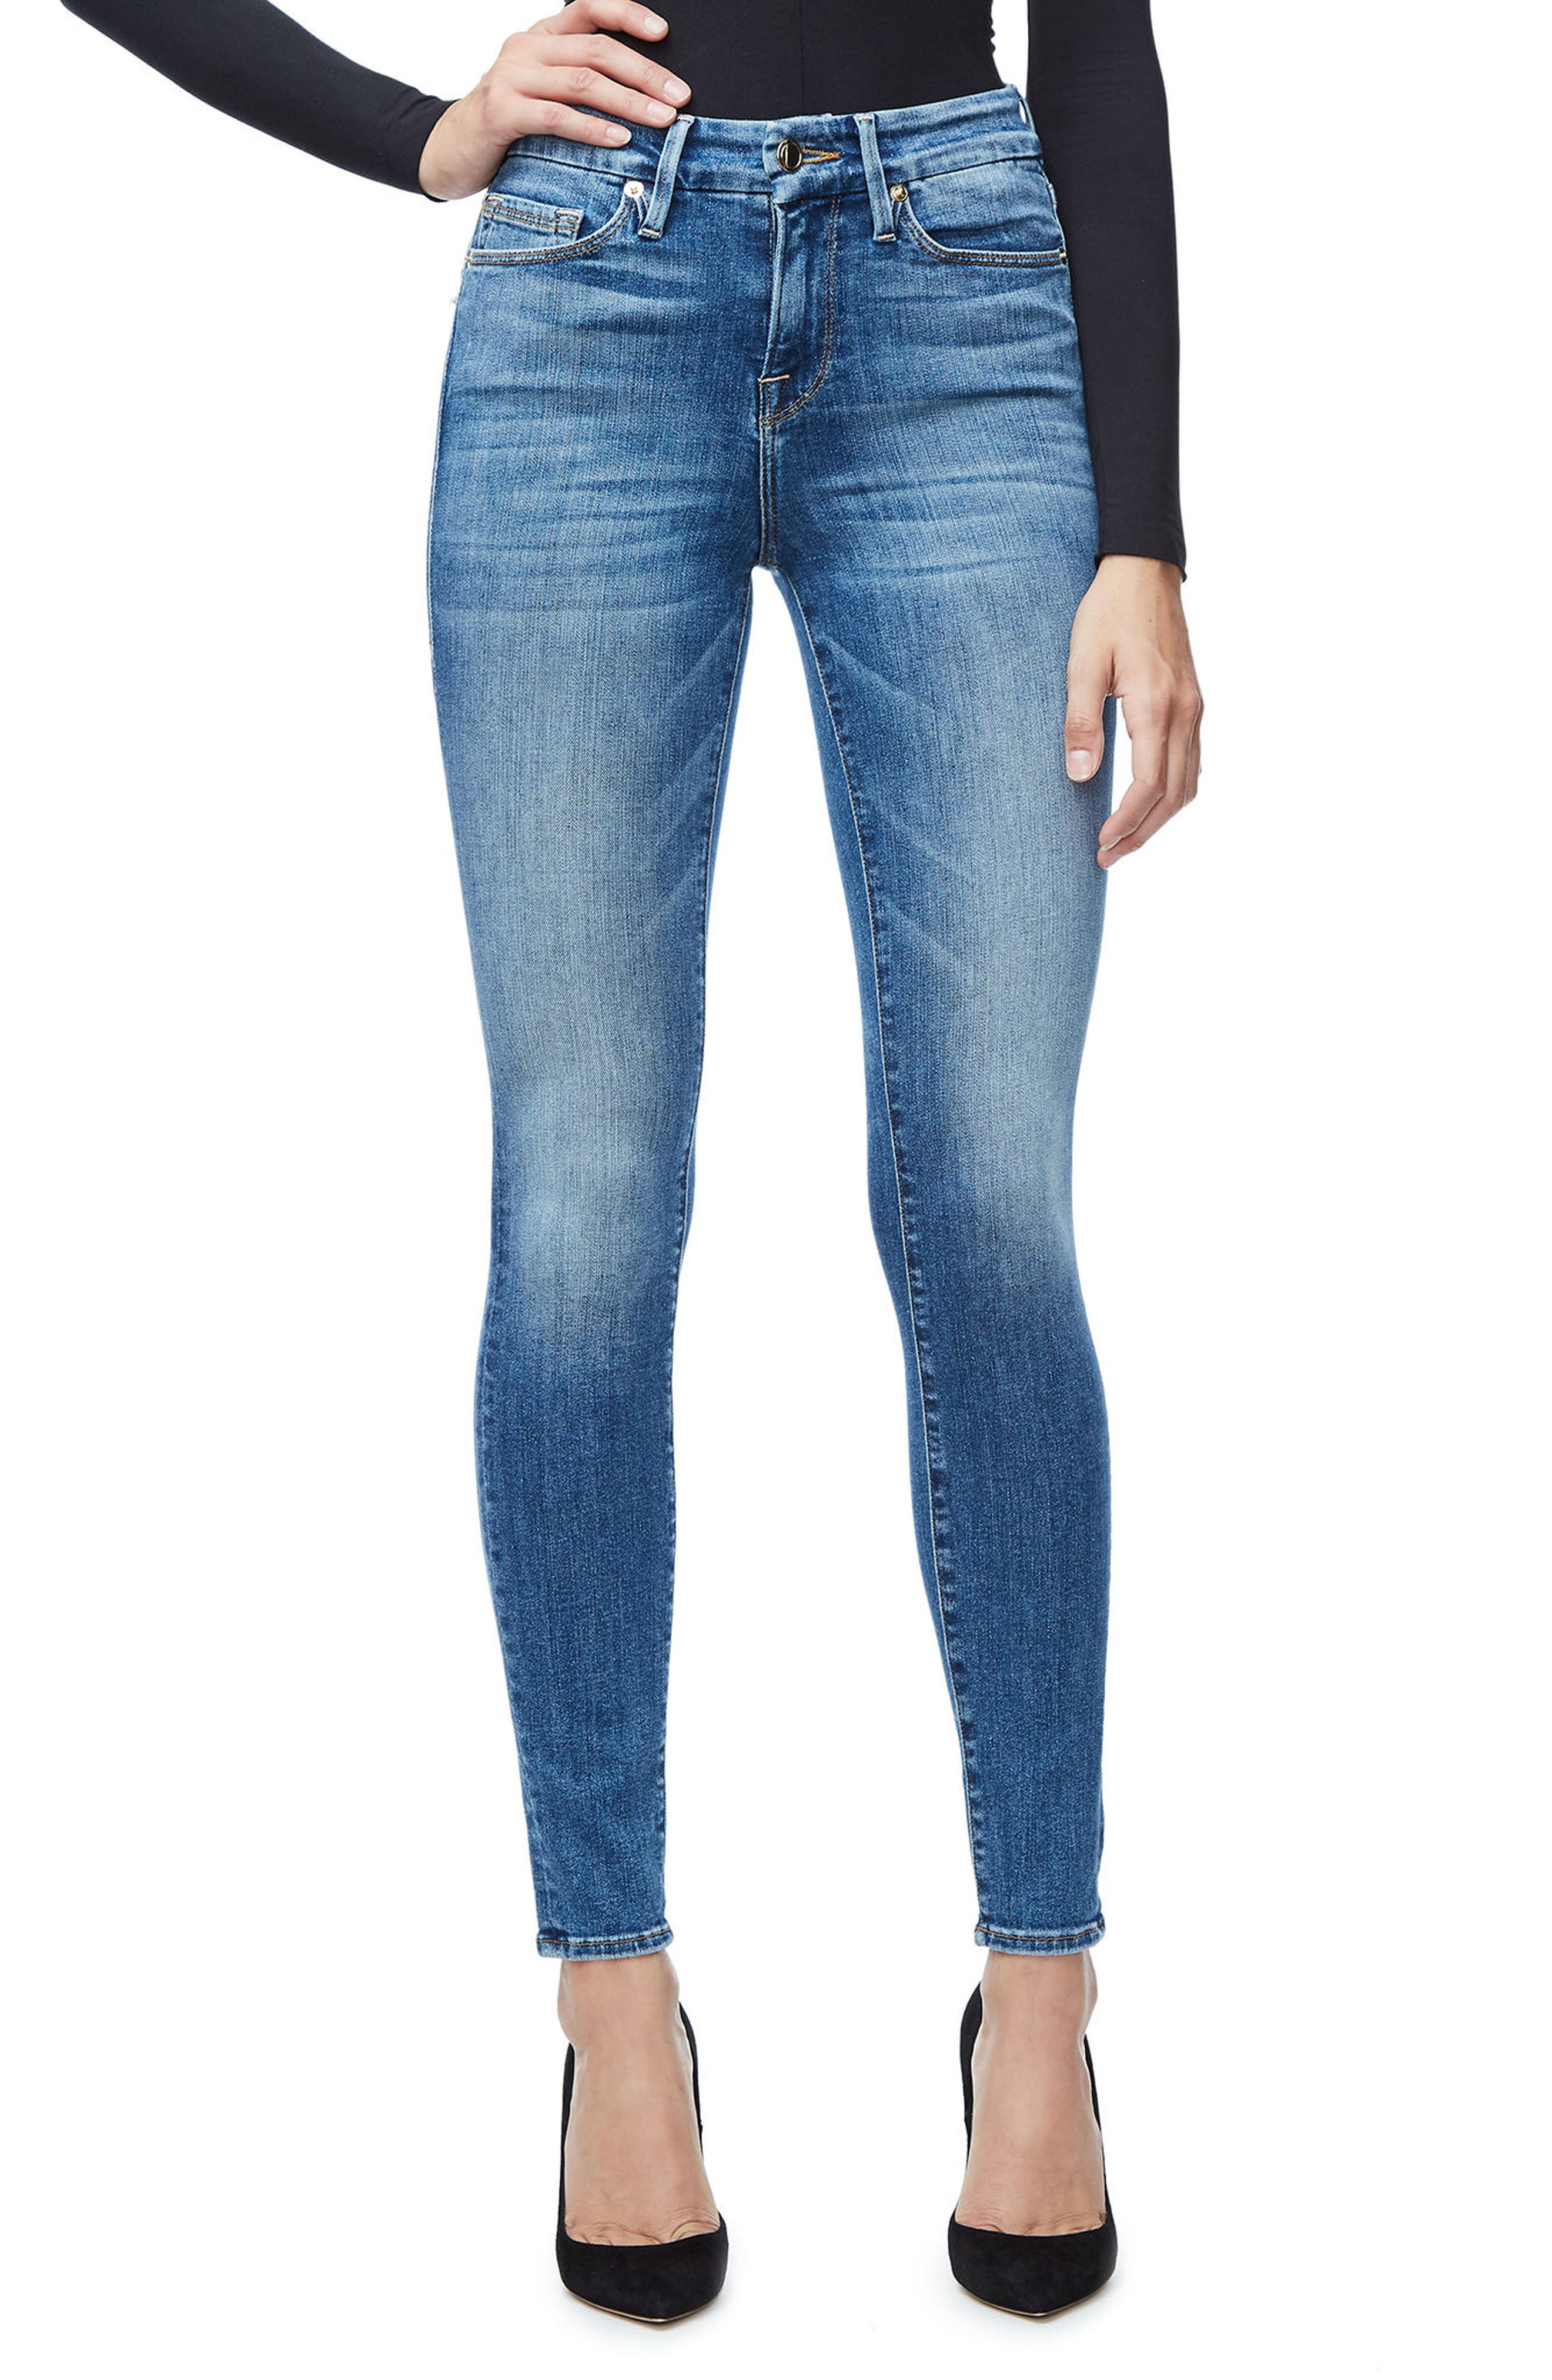 Alternate Image 1 Selected - Good American Good Legs High Waist Skinny Jeans (Blue 107)  (Regular & Plus Size)